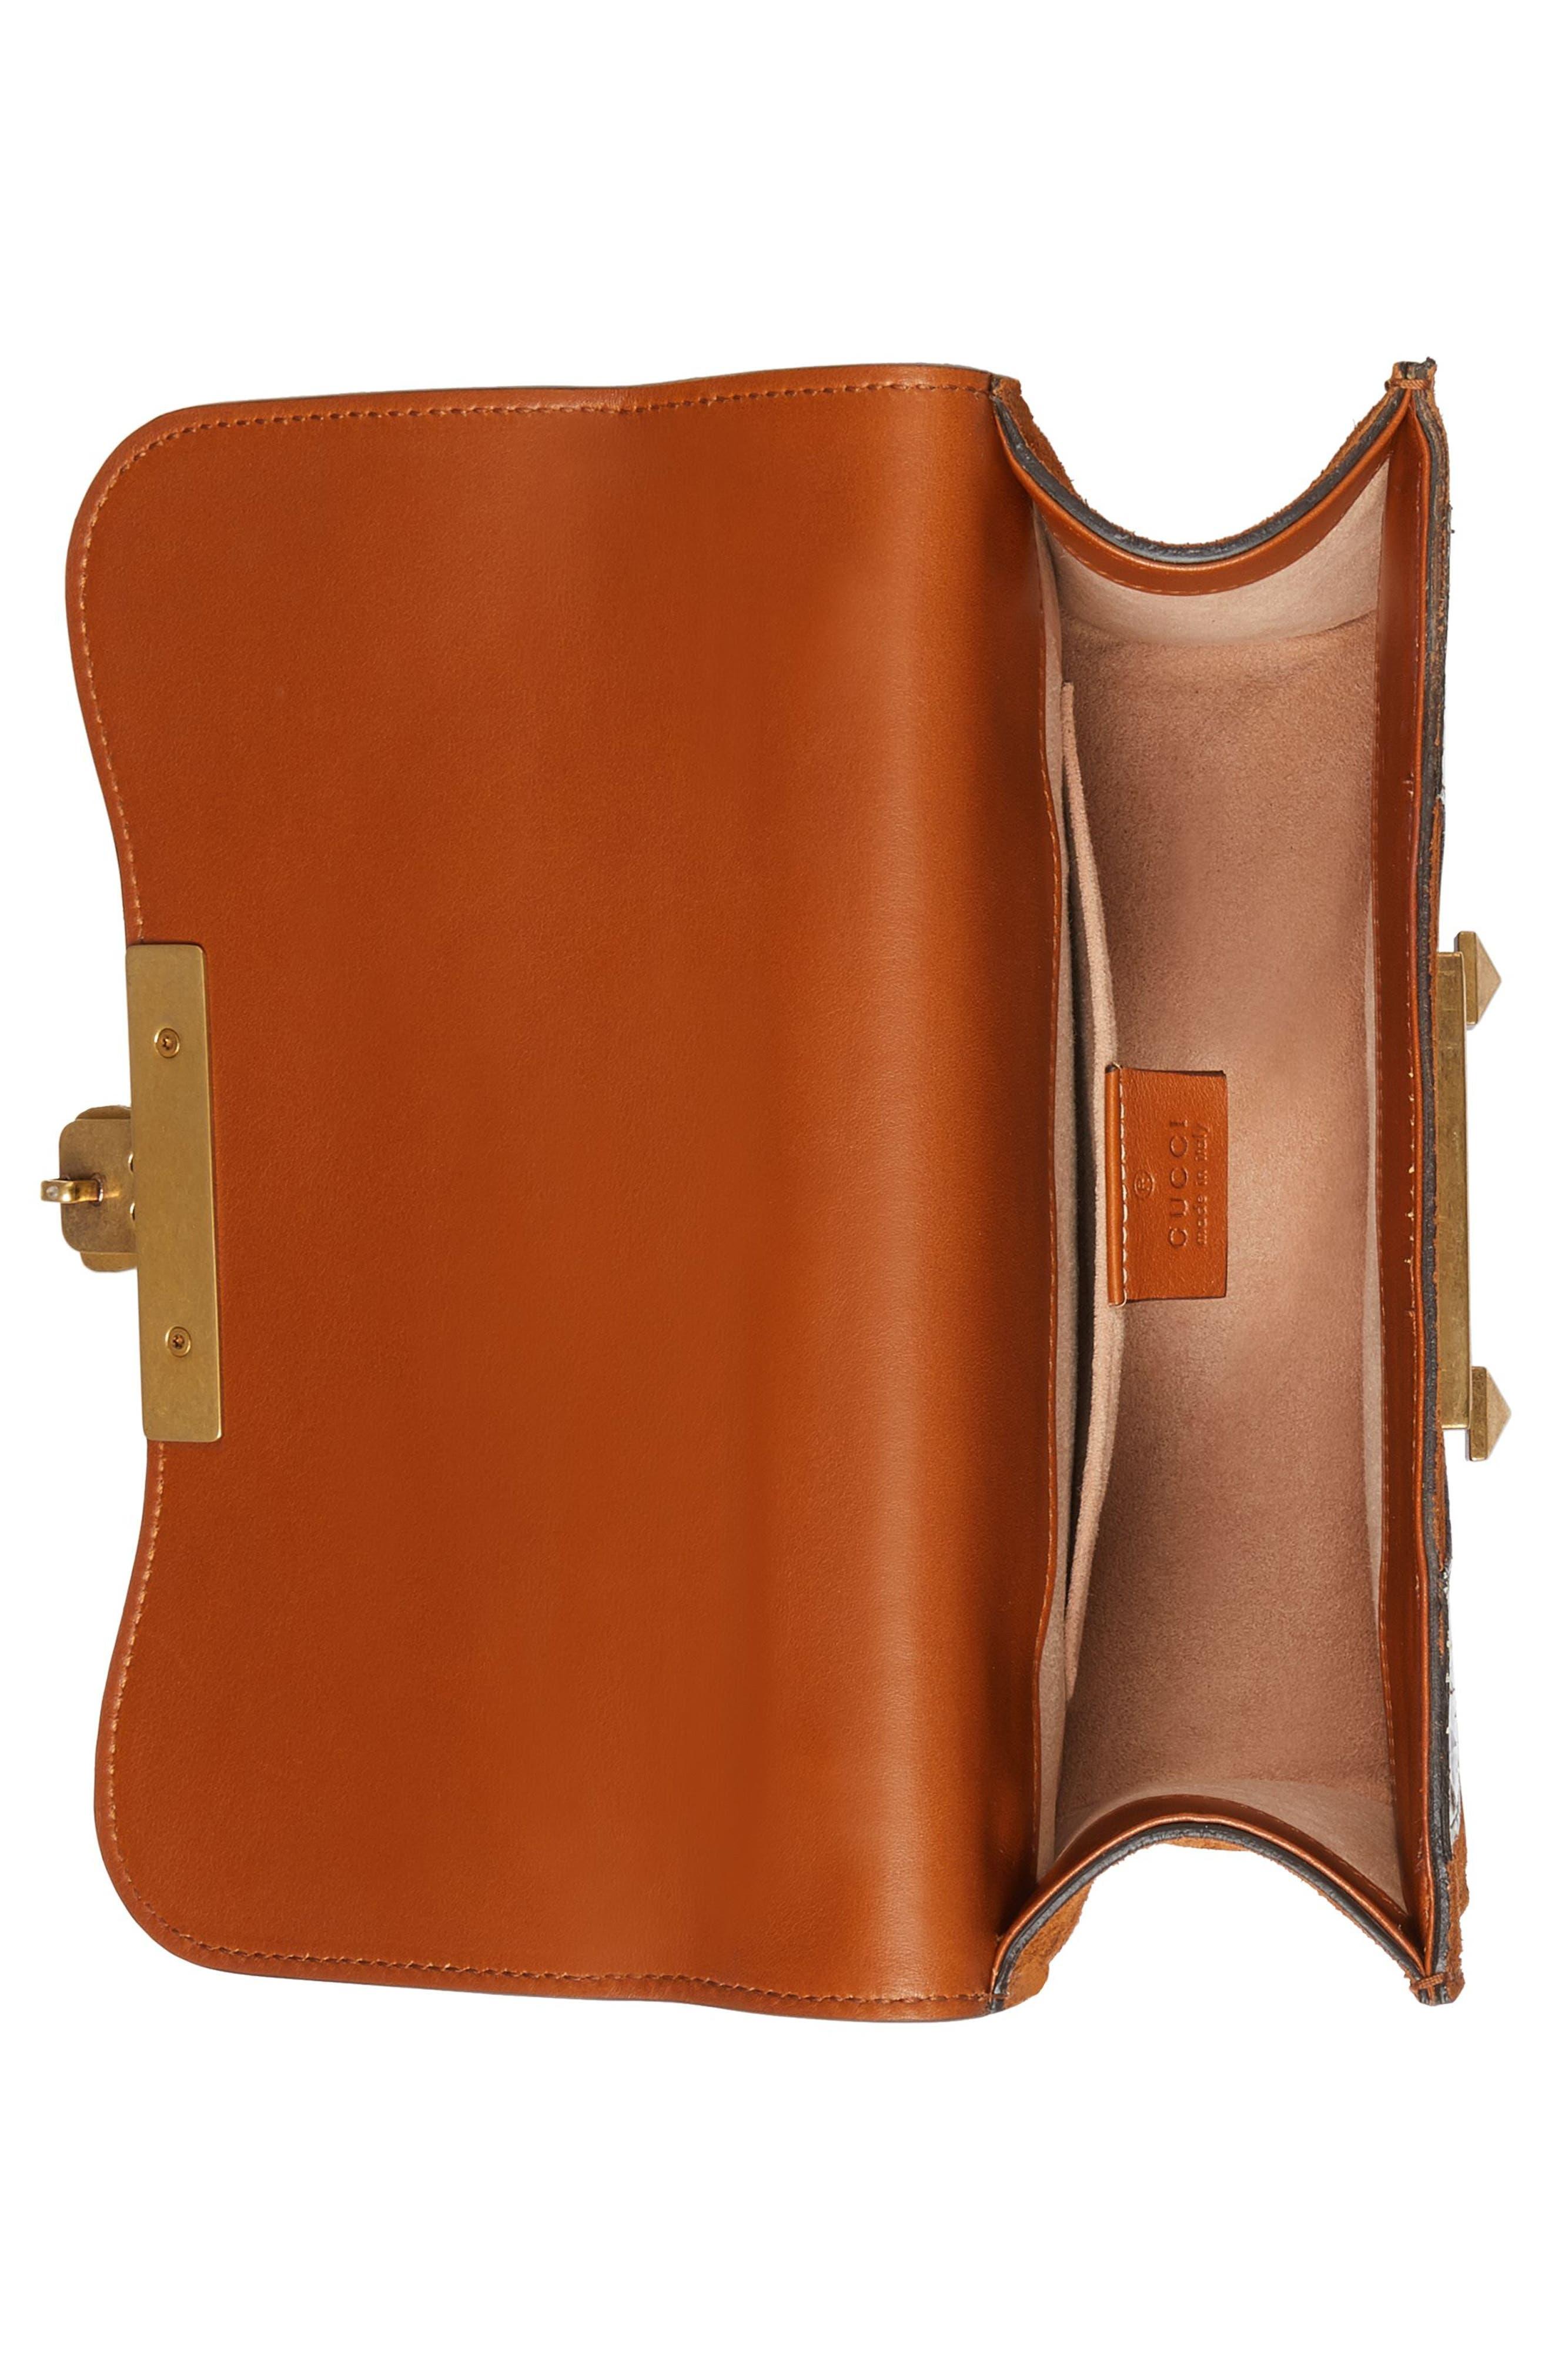 Osiride Suede & Genuine Snakeskin Shoulder Bag,                             Alternate thumbnail 3, color,                             Bright Cuir/ Roccia